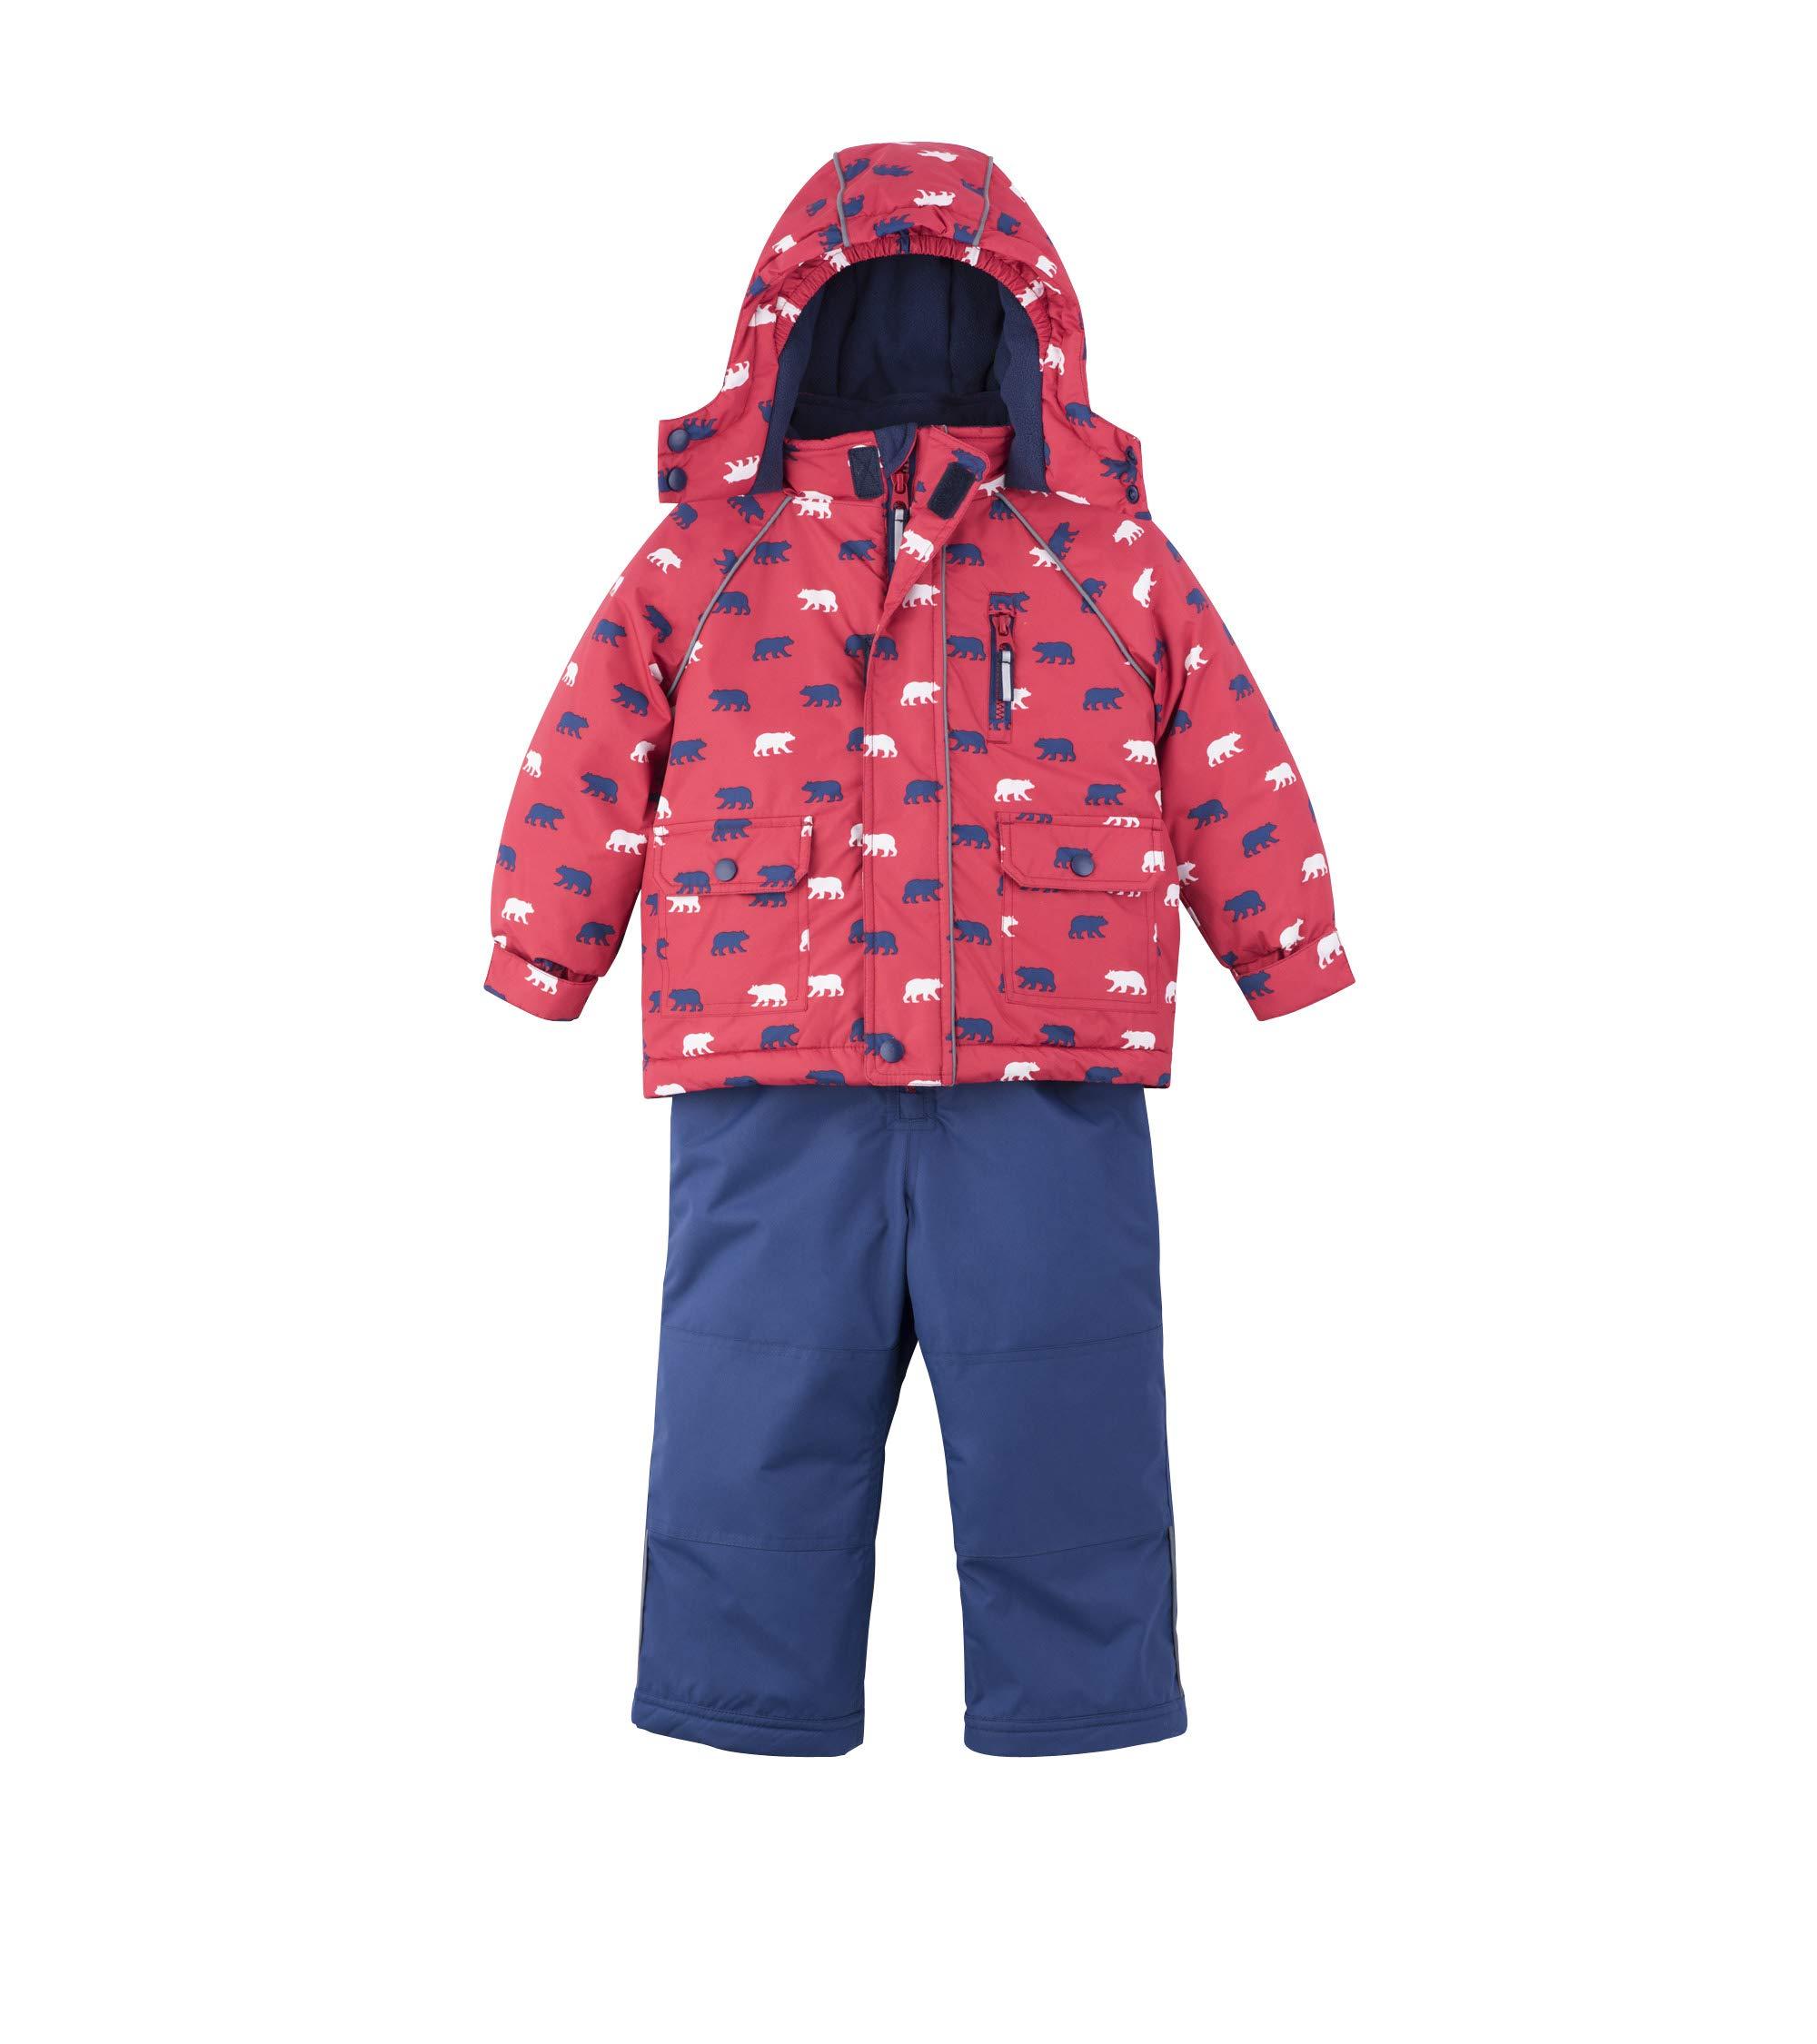 Hatley Baby Boys Snow Suit Set, Polar Bear, 12-18 Months by Hatley